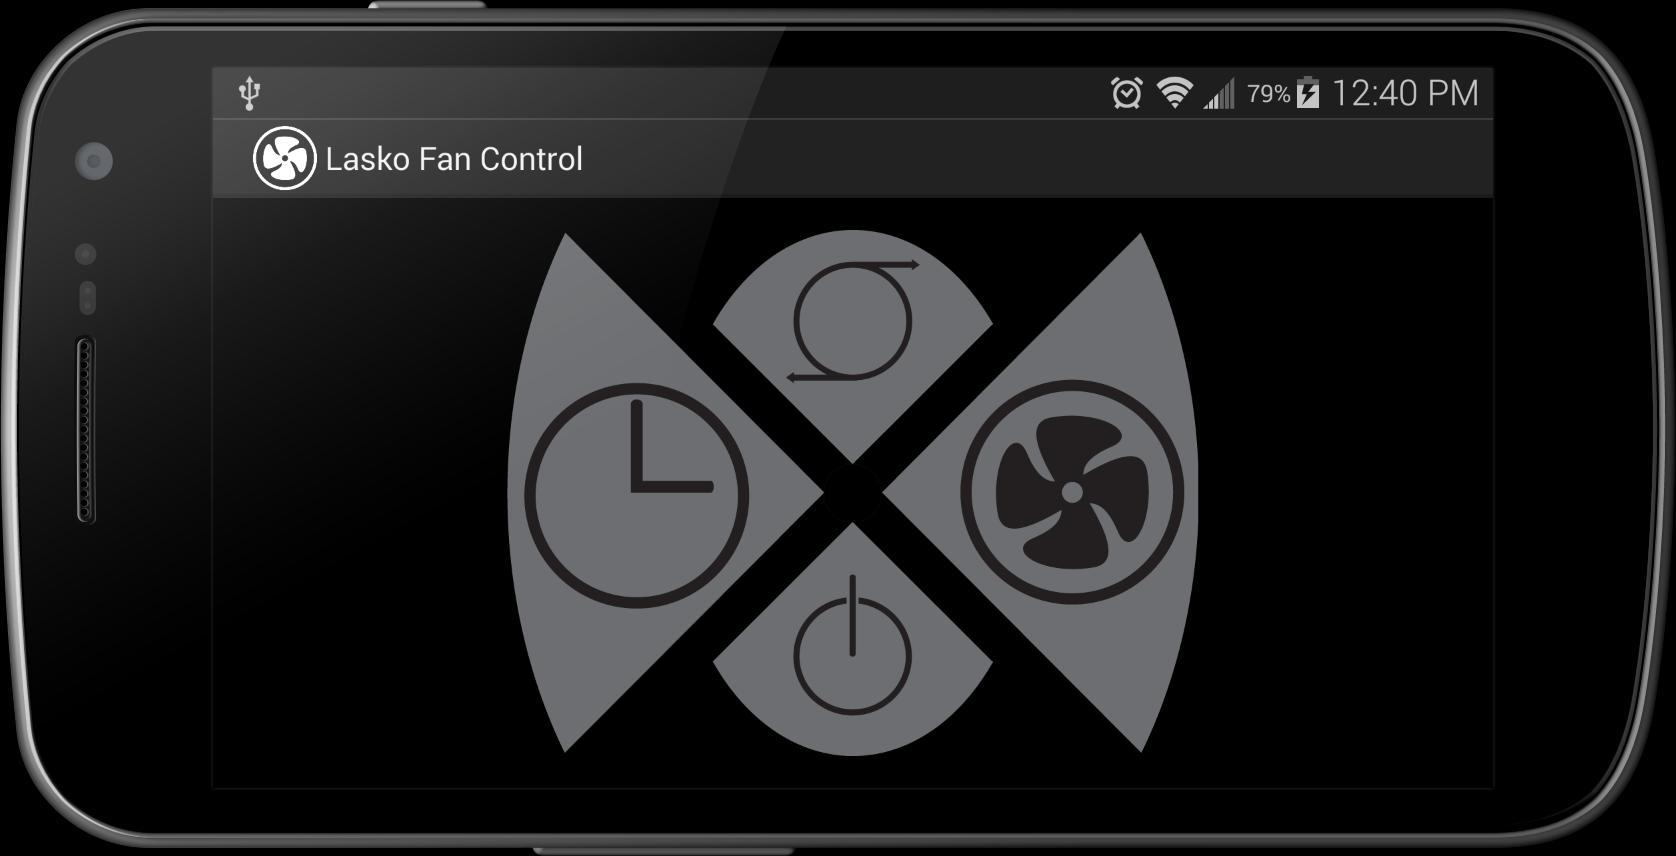 Lasko Fan Remote Control for Android - APK Download